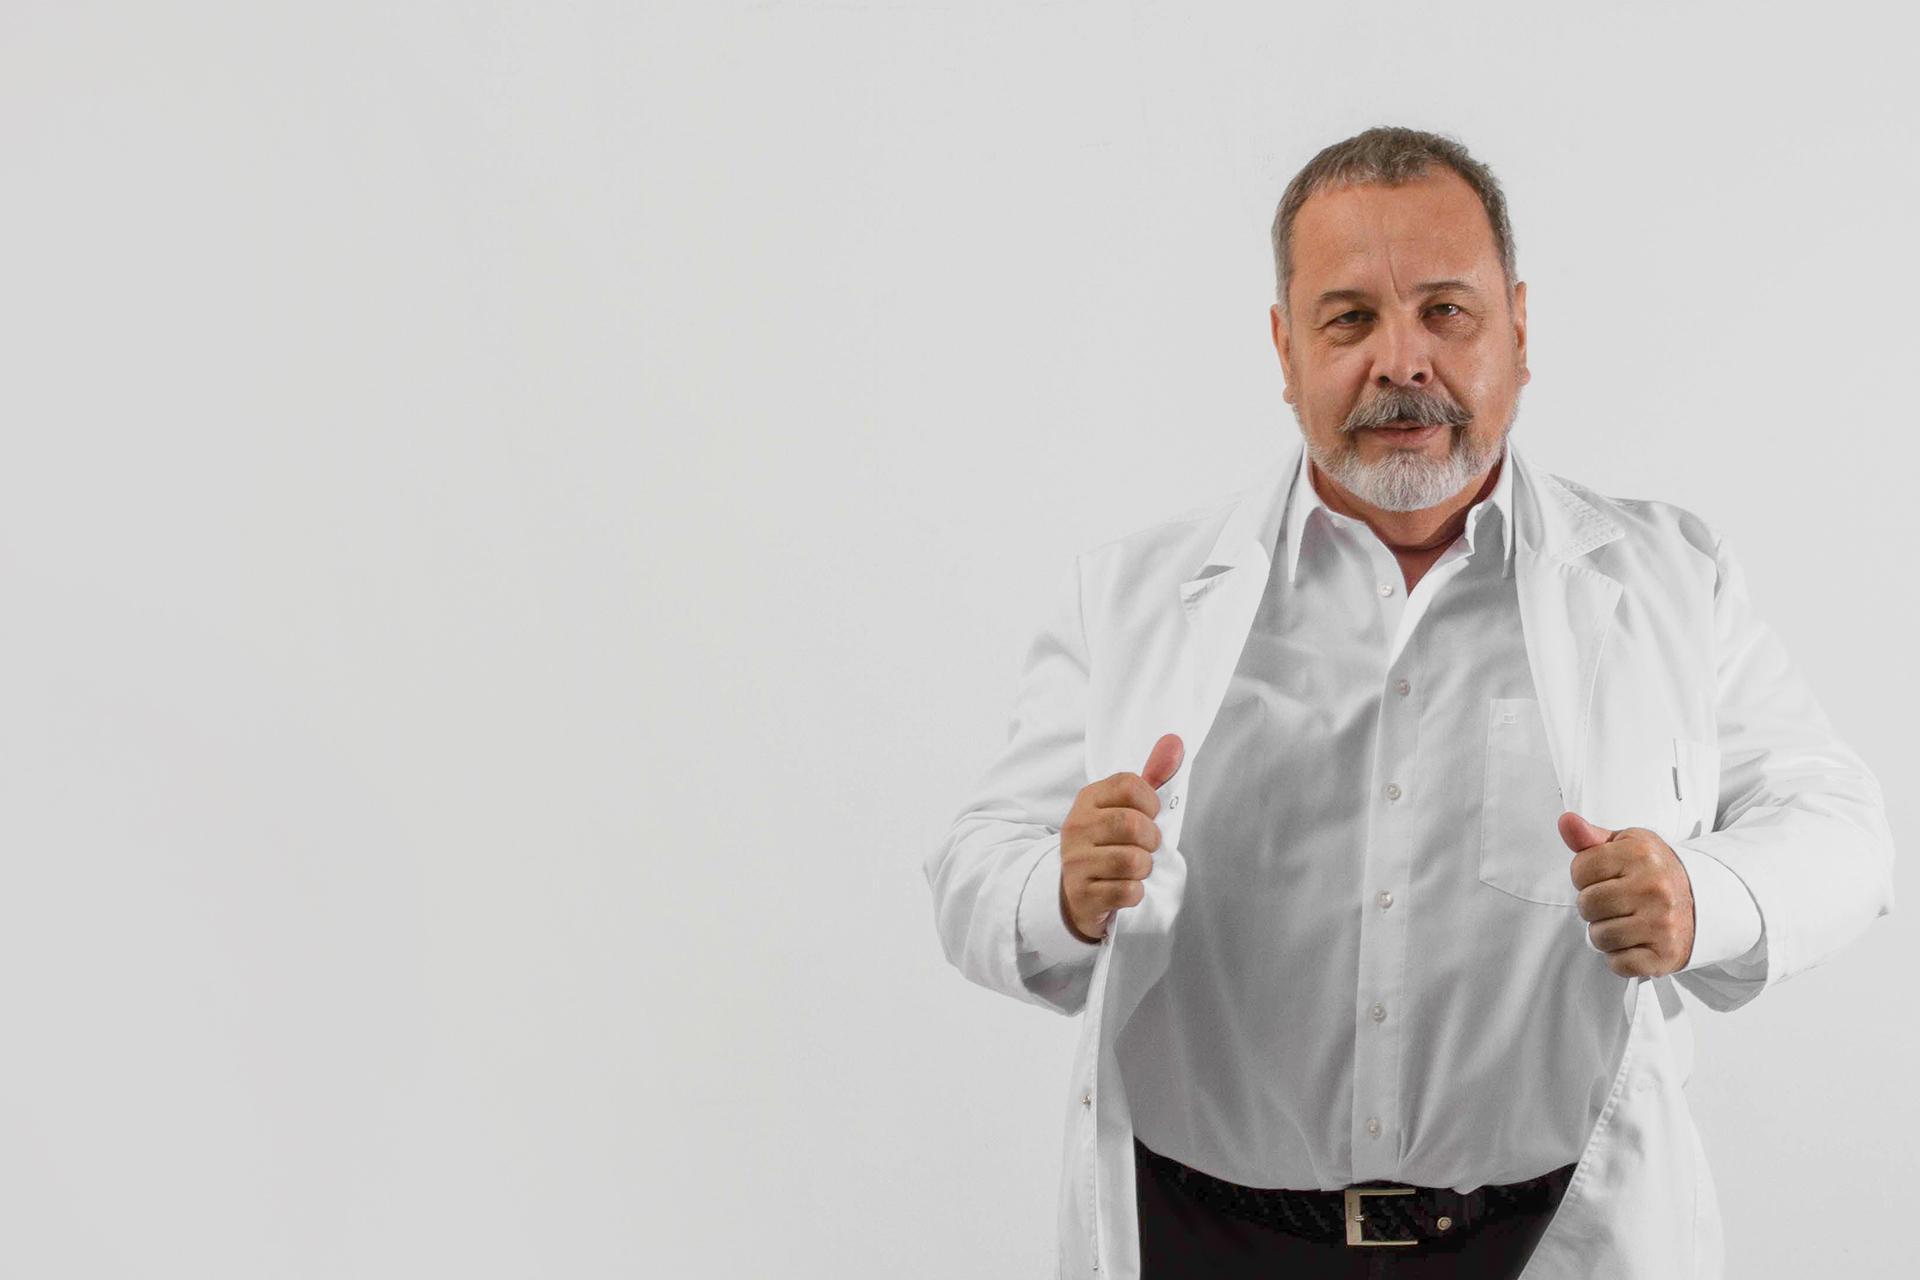 онлайн школа обучения диетологии Сам себе диетолог